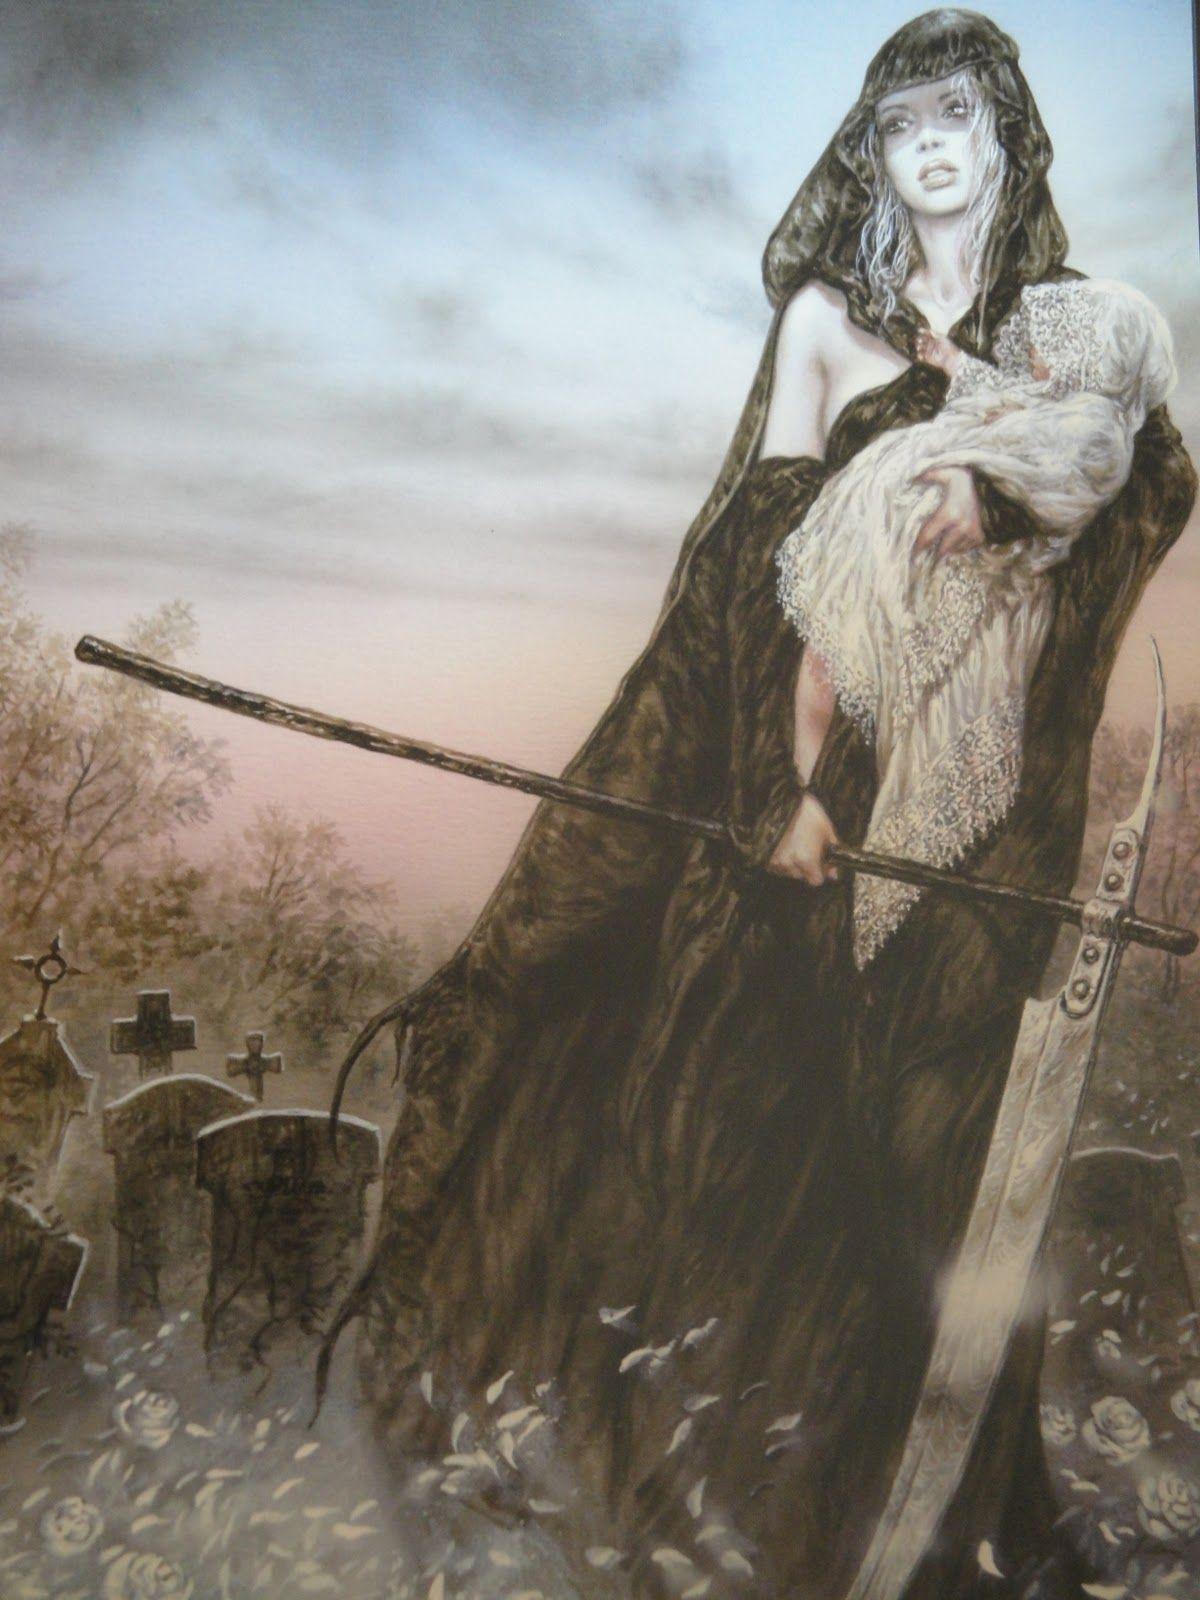 Hel Norse goddess of death. Daughter of Loki.Ruler of Hell located in Niflheim.